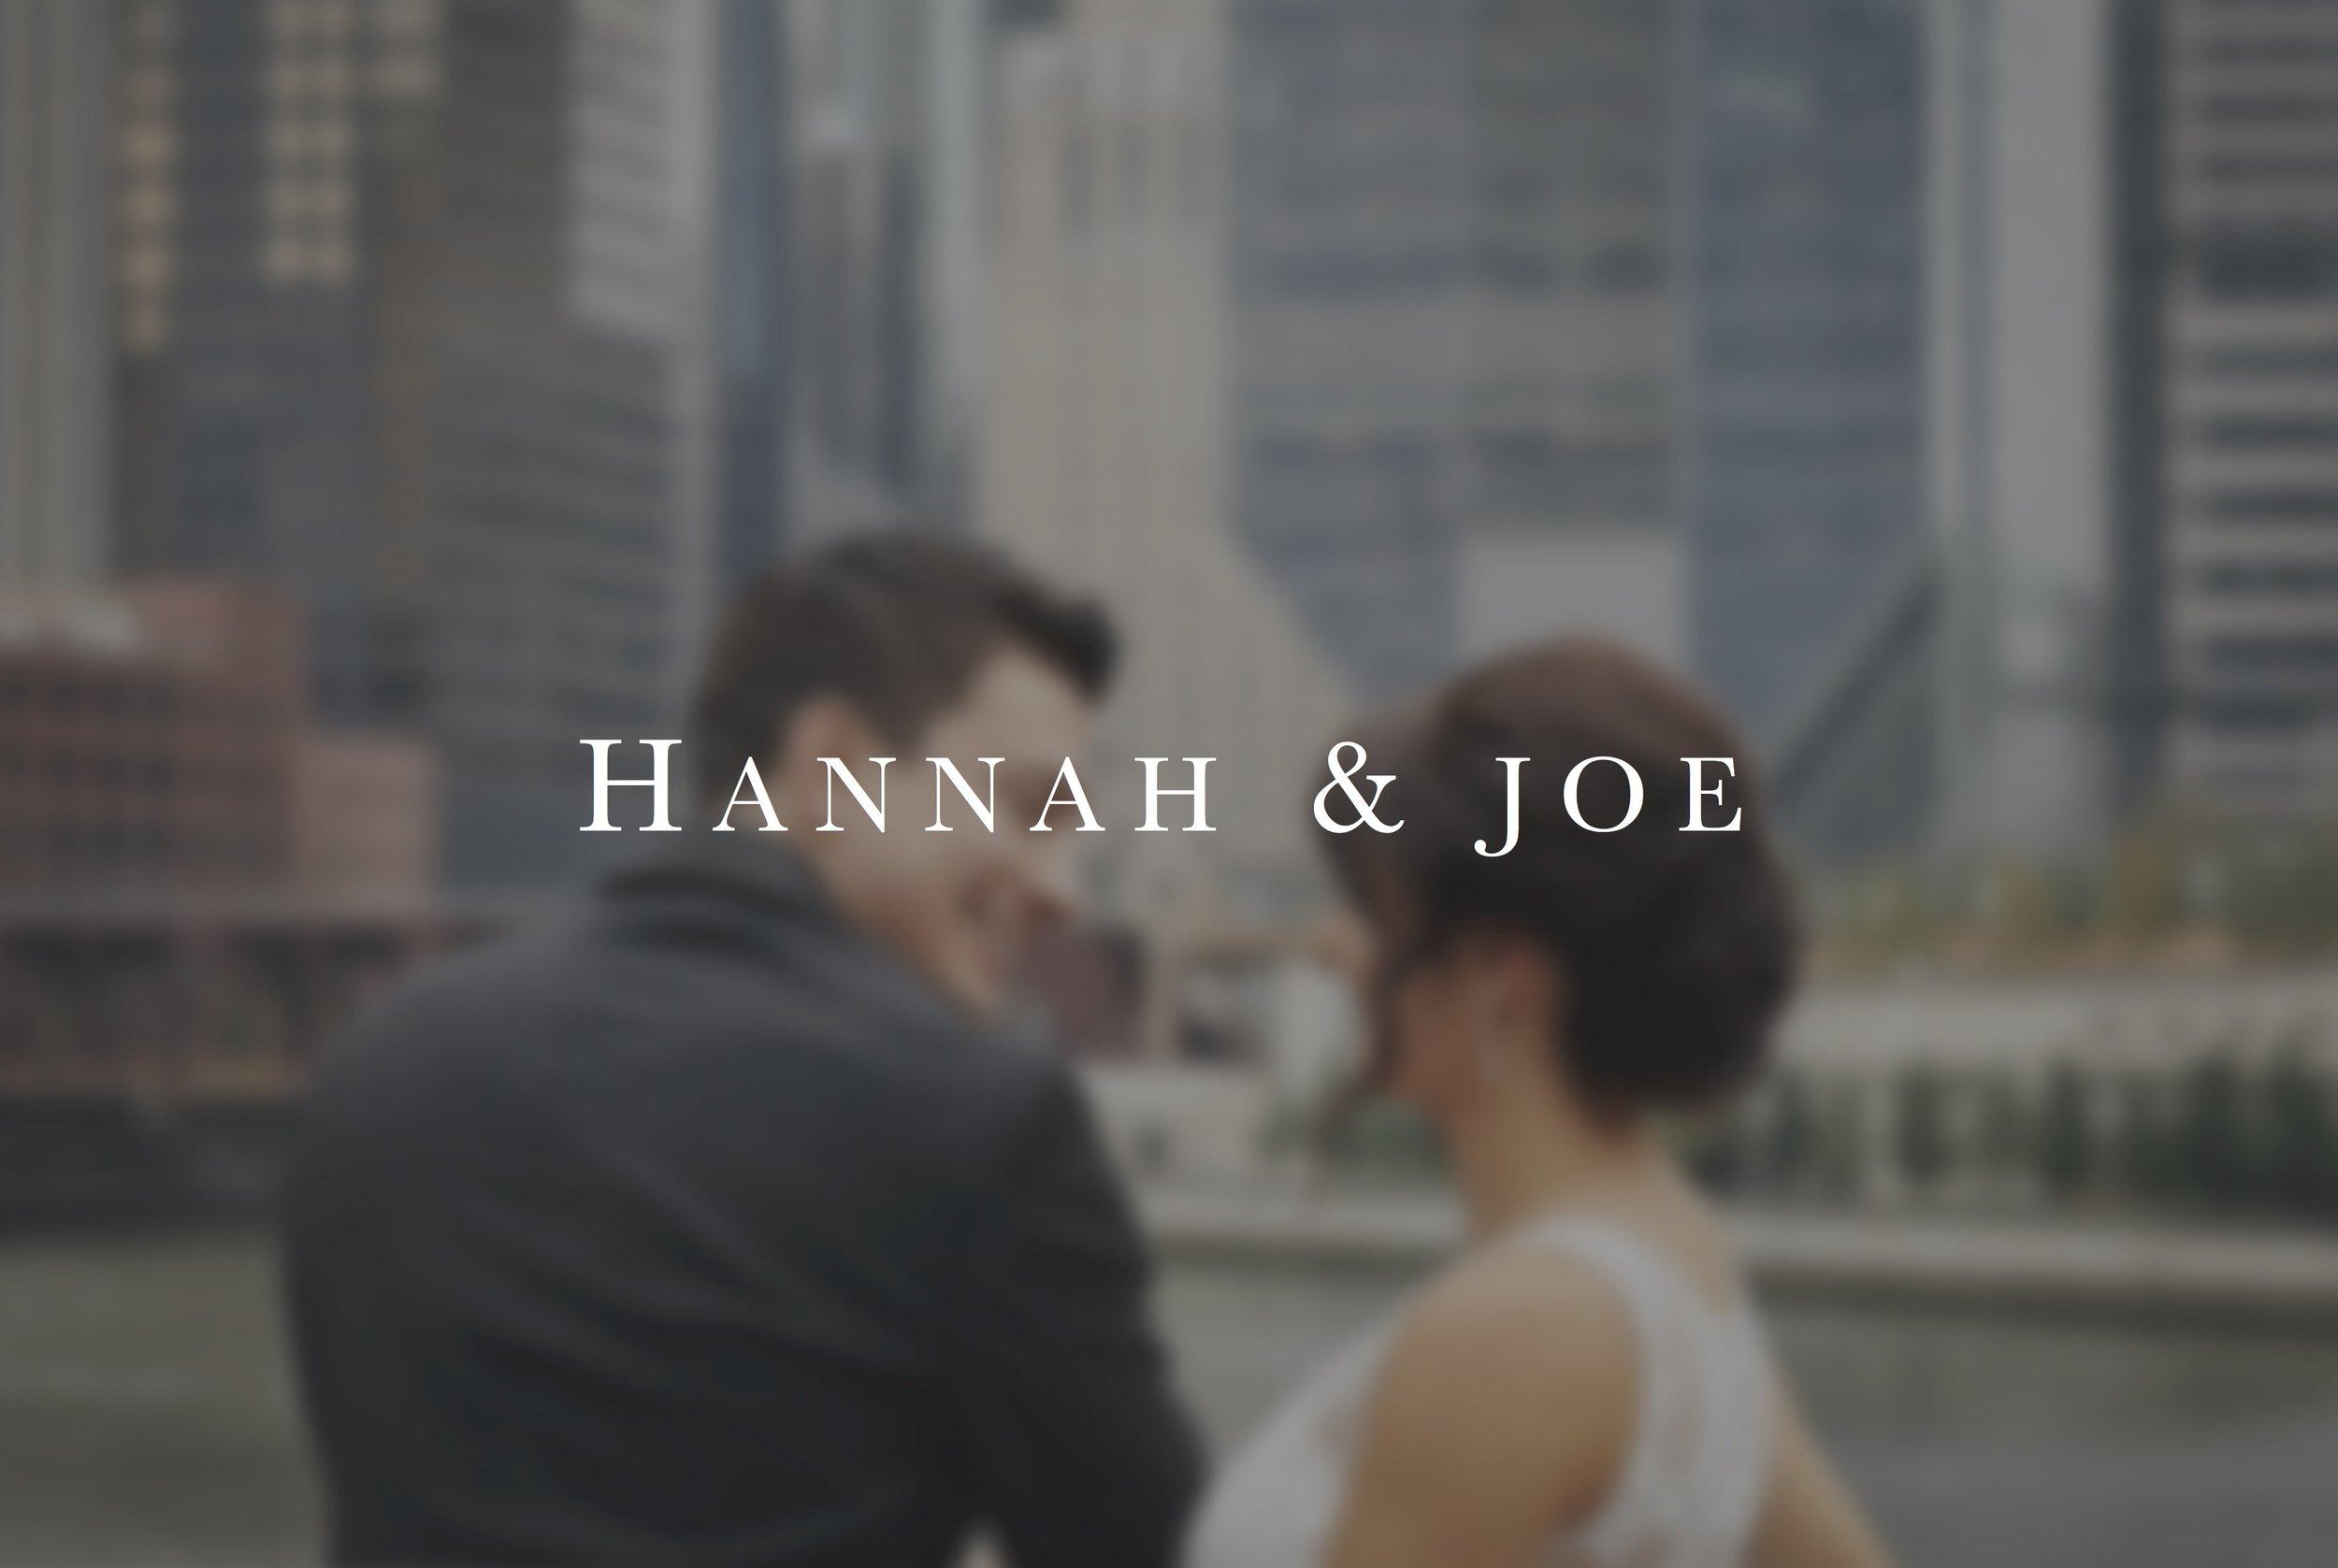 H&J Title.jpg